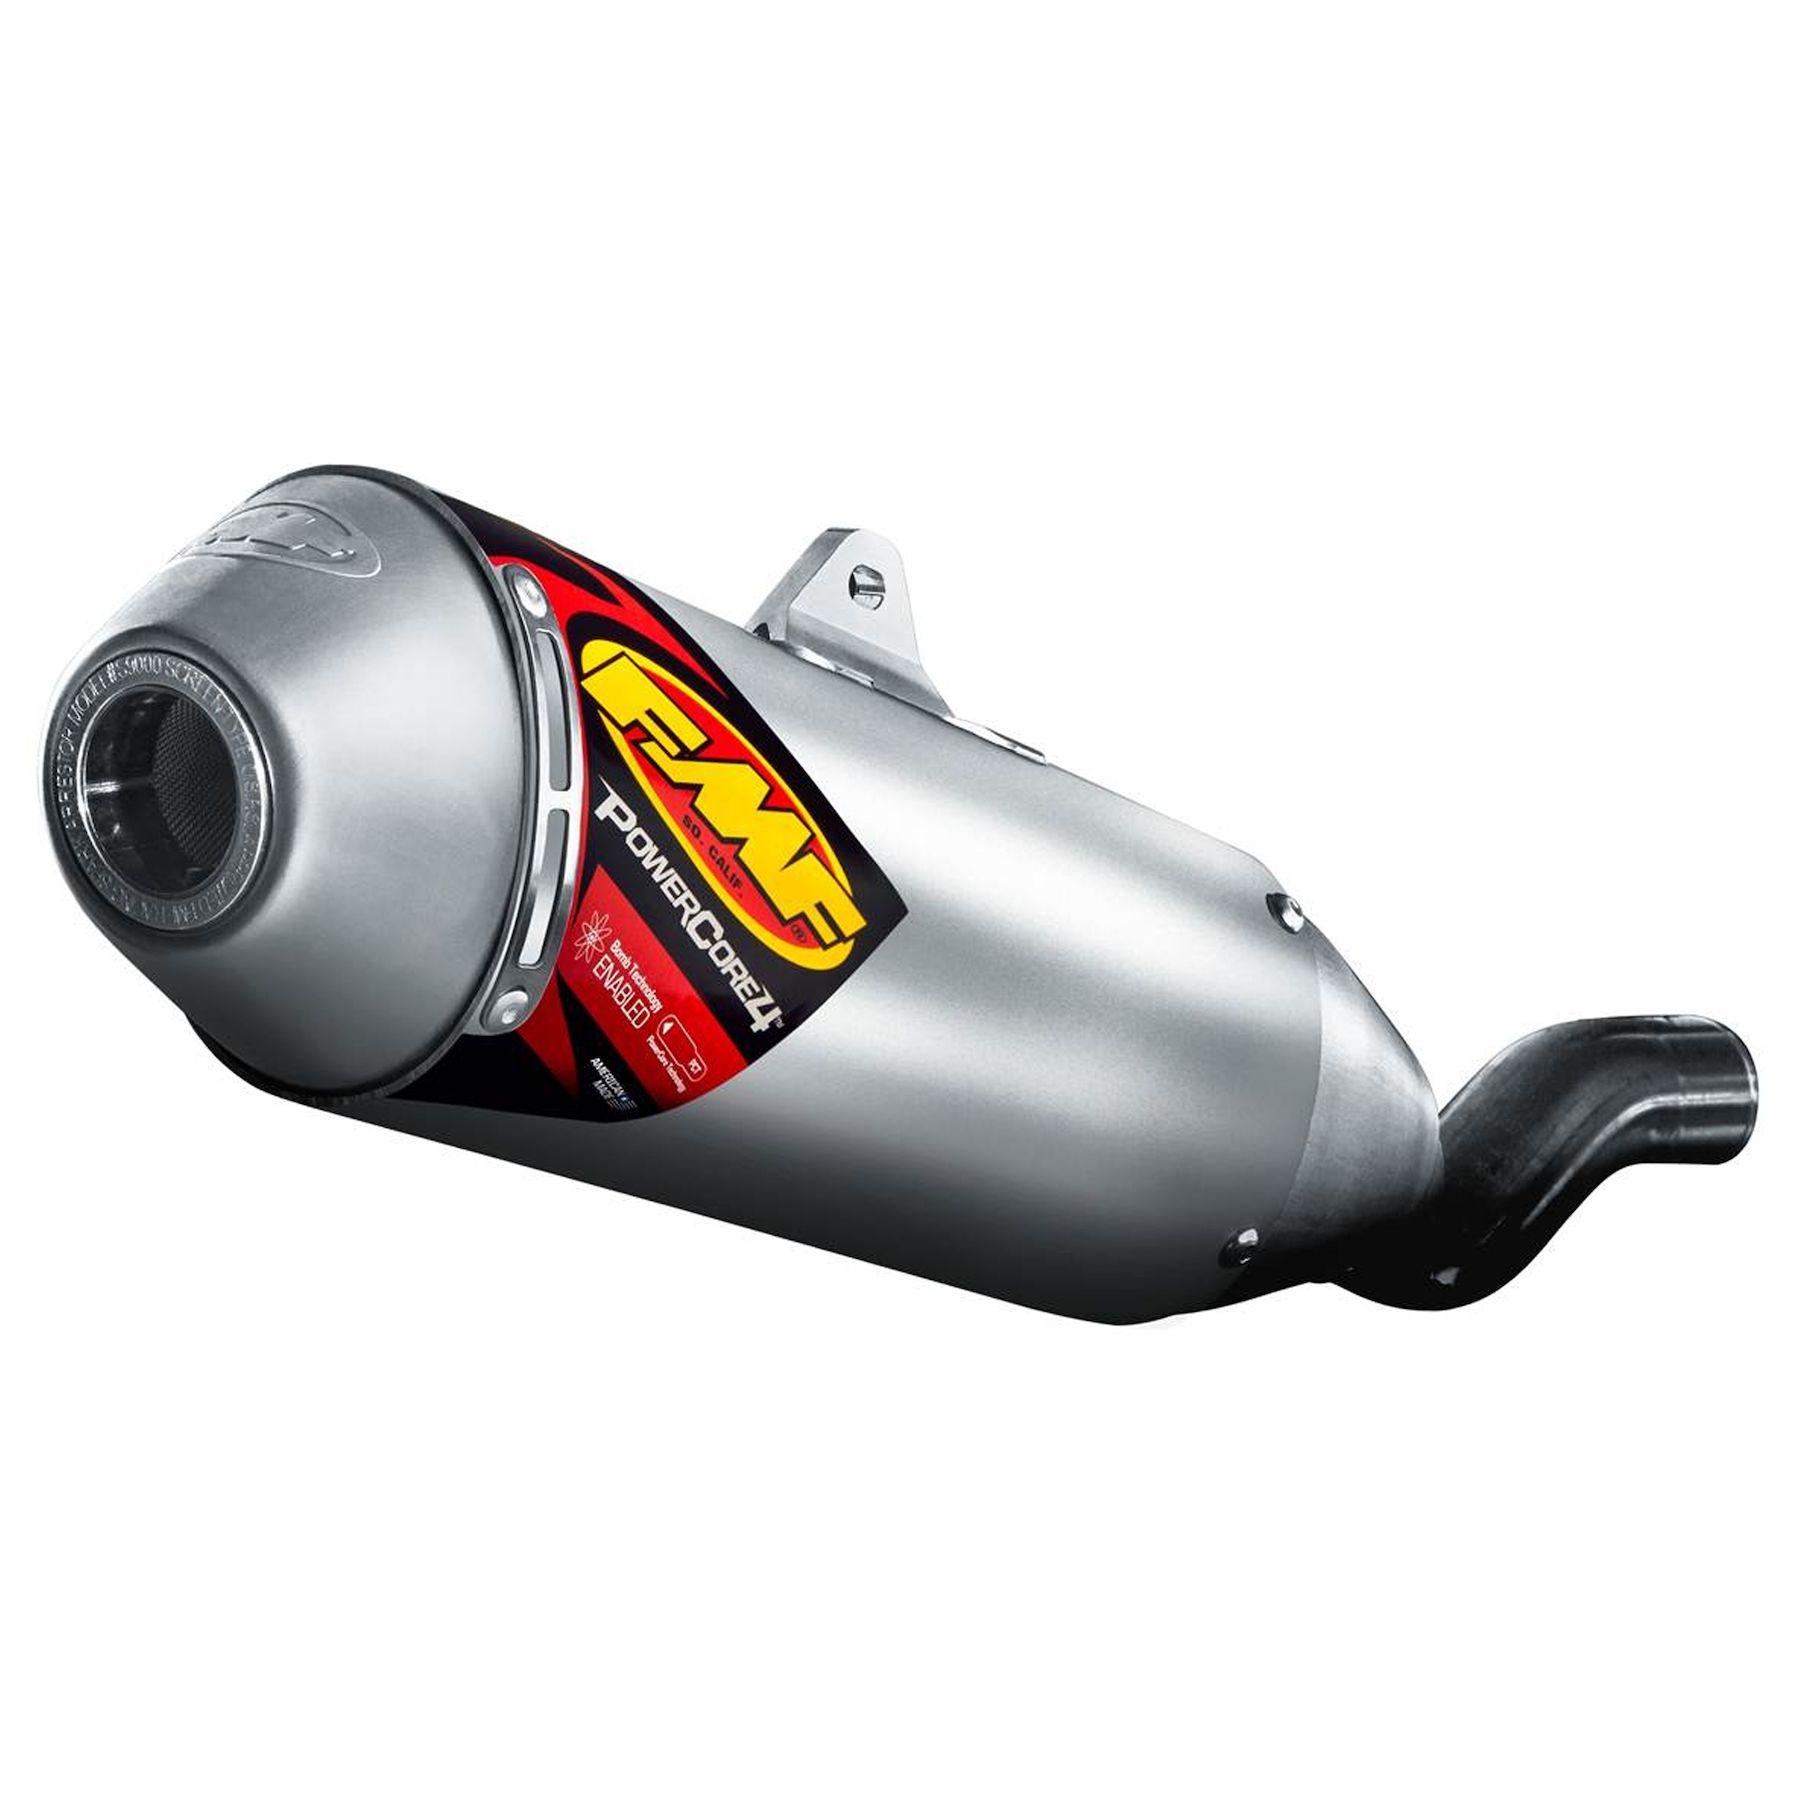 YAMAHA YZ YZ400 YZ426 YZ250F XT250 WR250 TW WR  throttle tube sleeve /& grips set